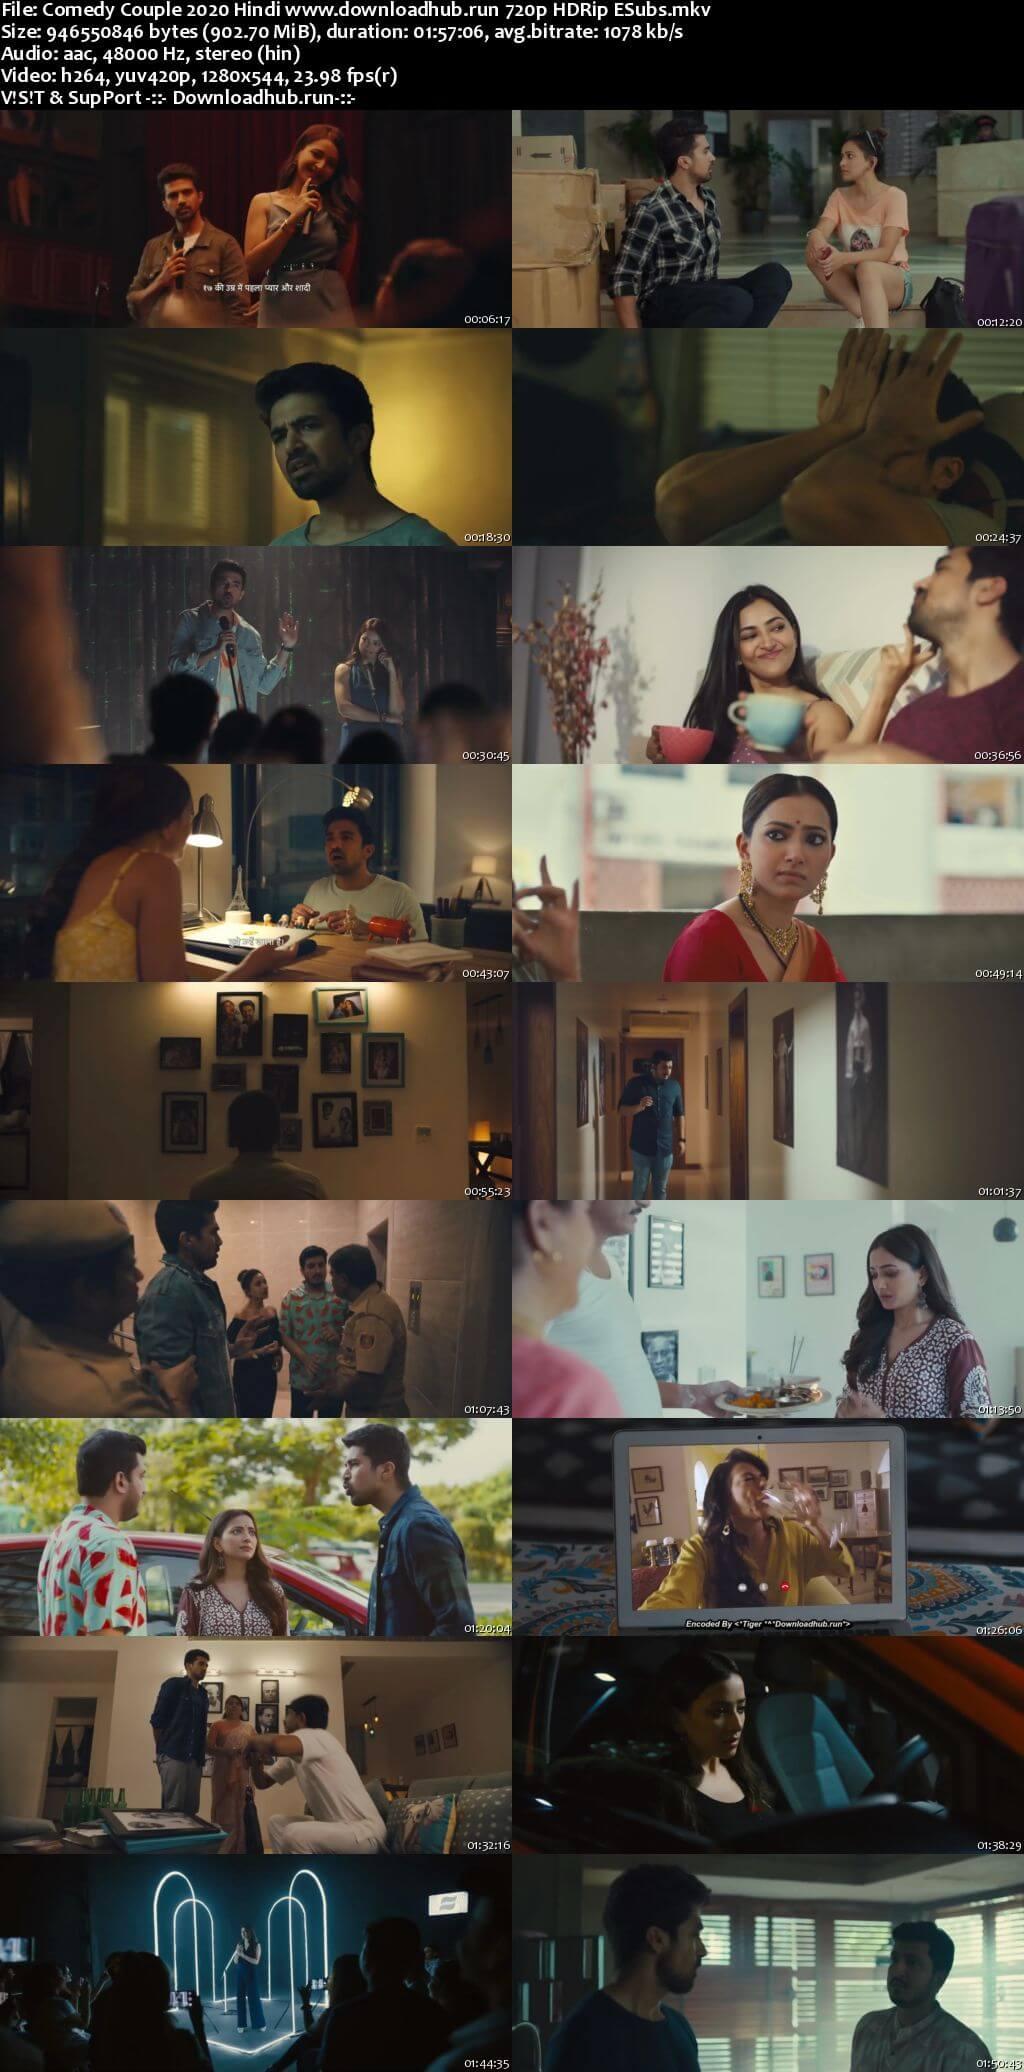 Comedy Couple 2020 Hindi 720p HDRip ESubs